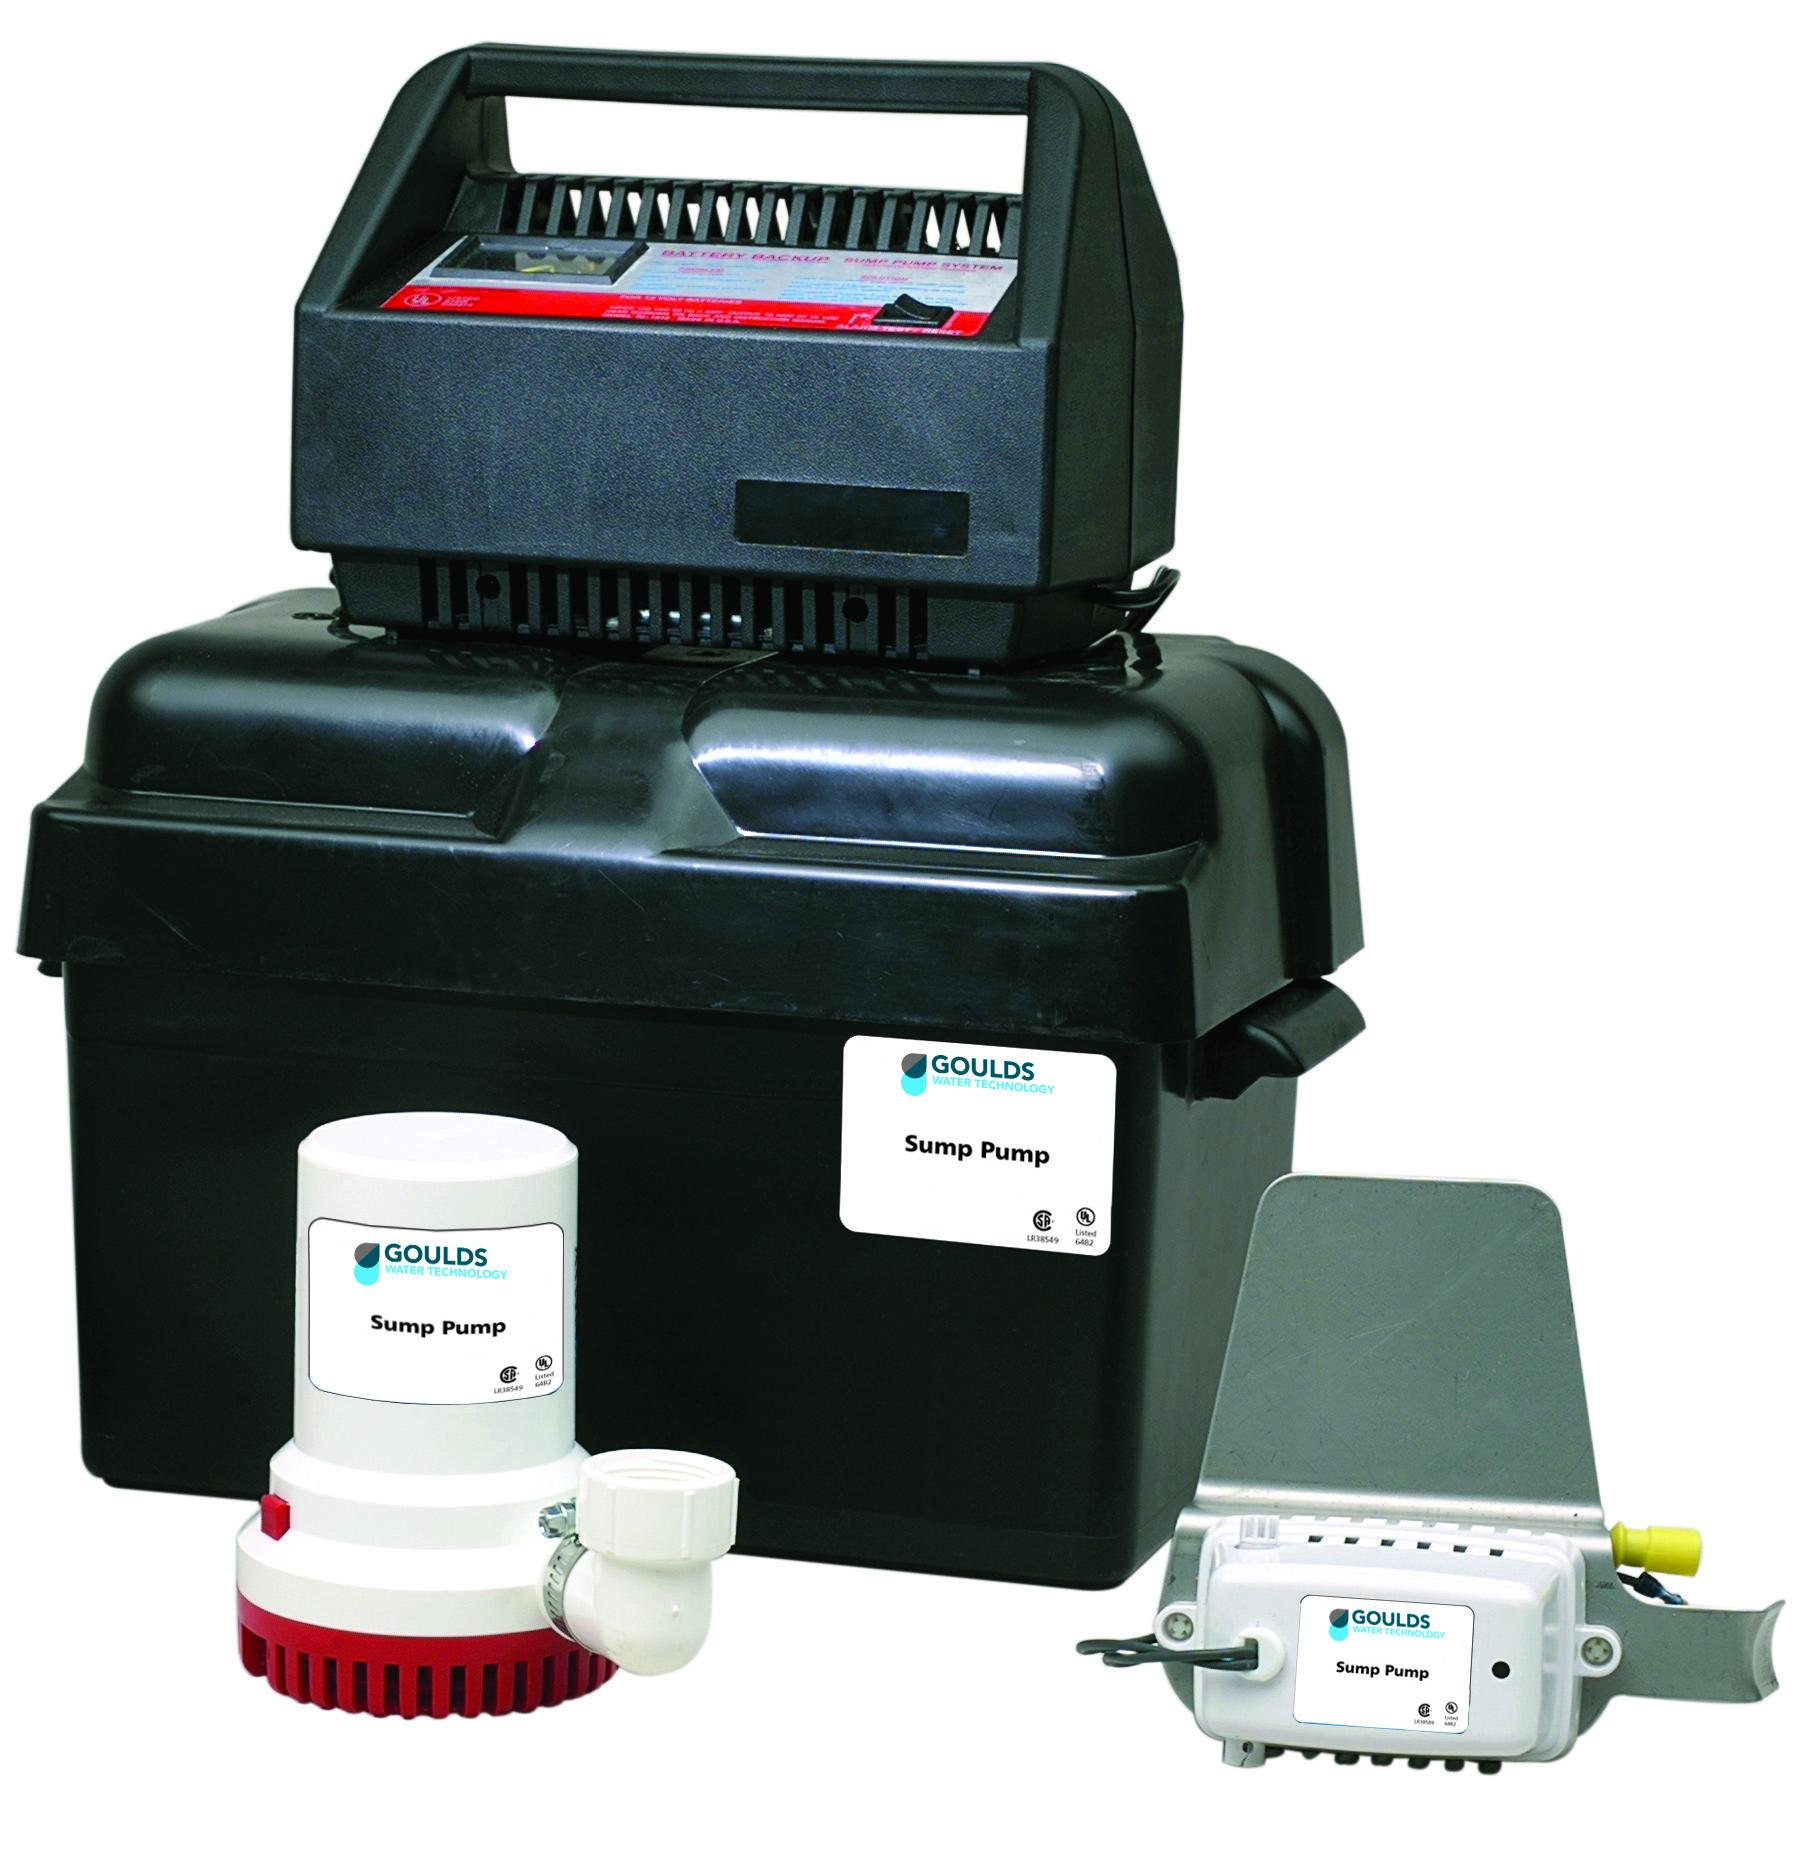 SPBB Battery Backup System – OBSOLETE